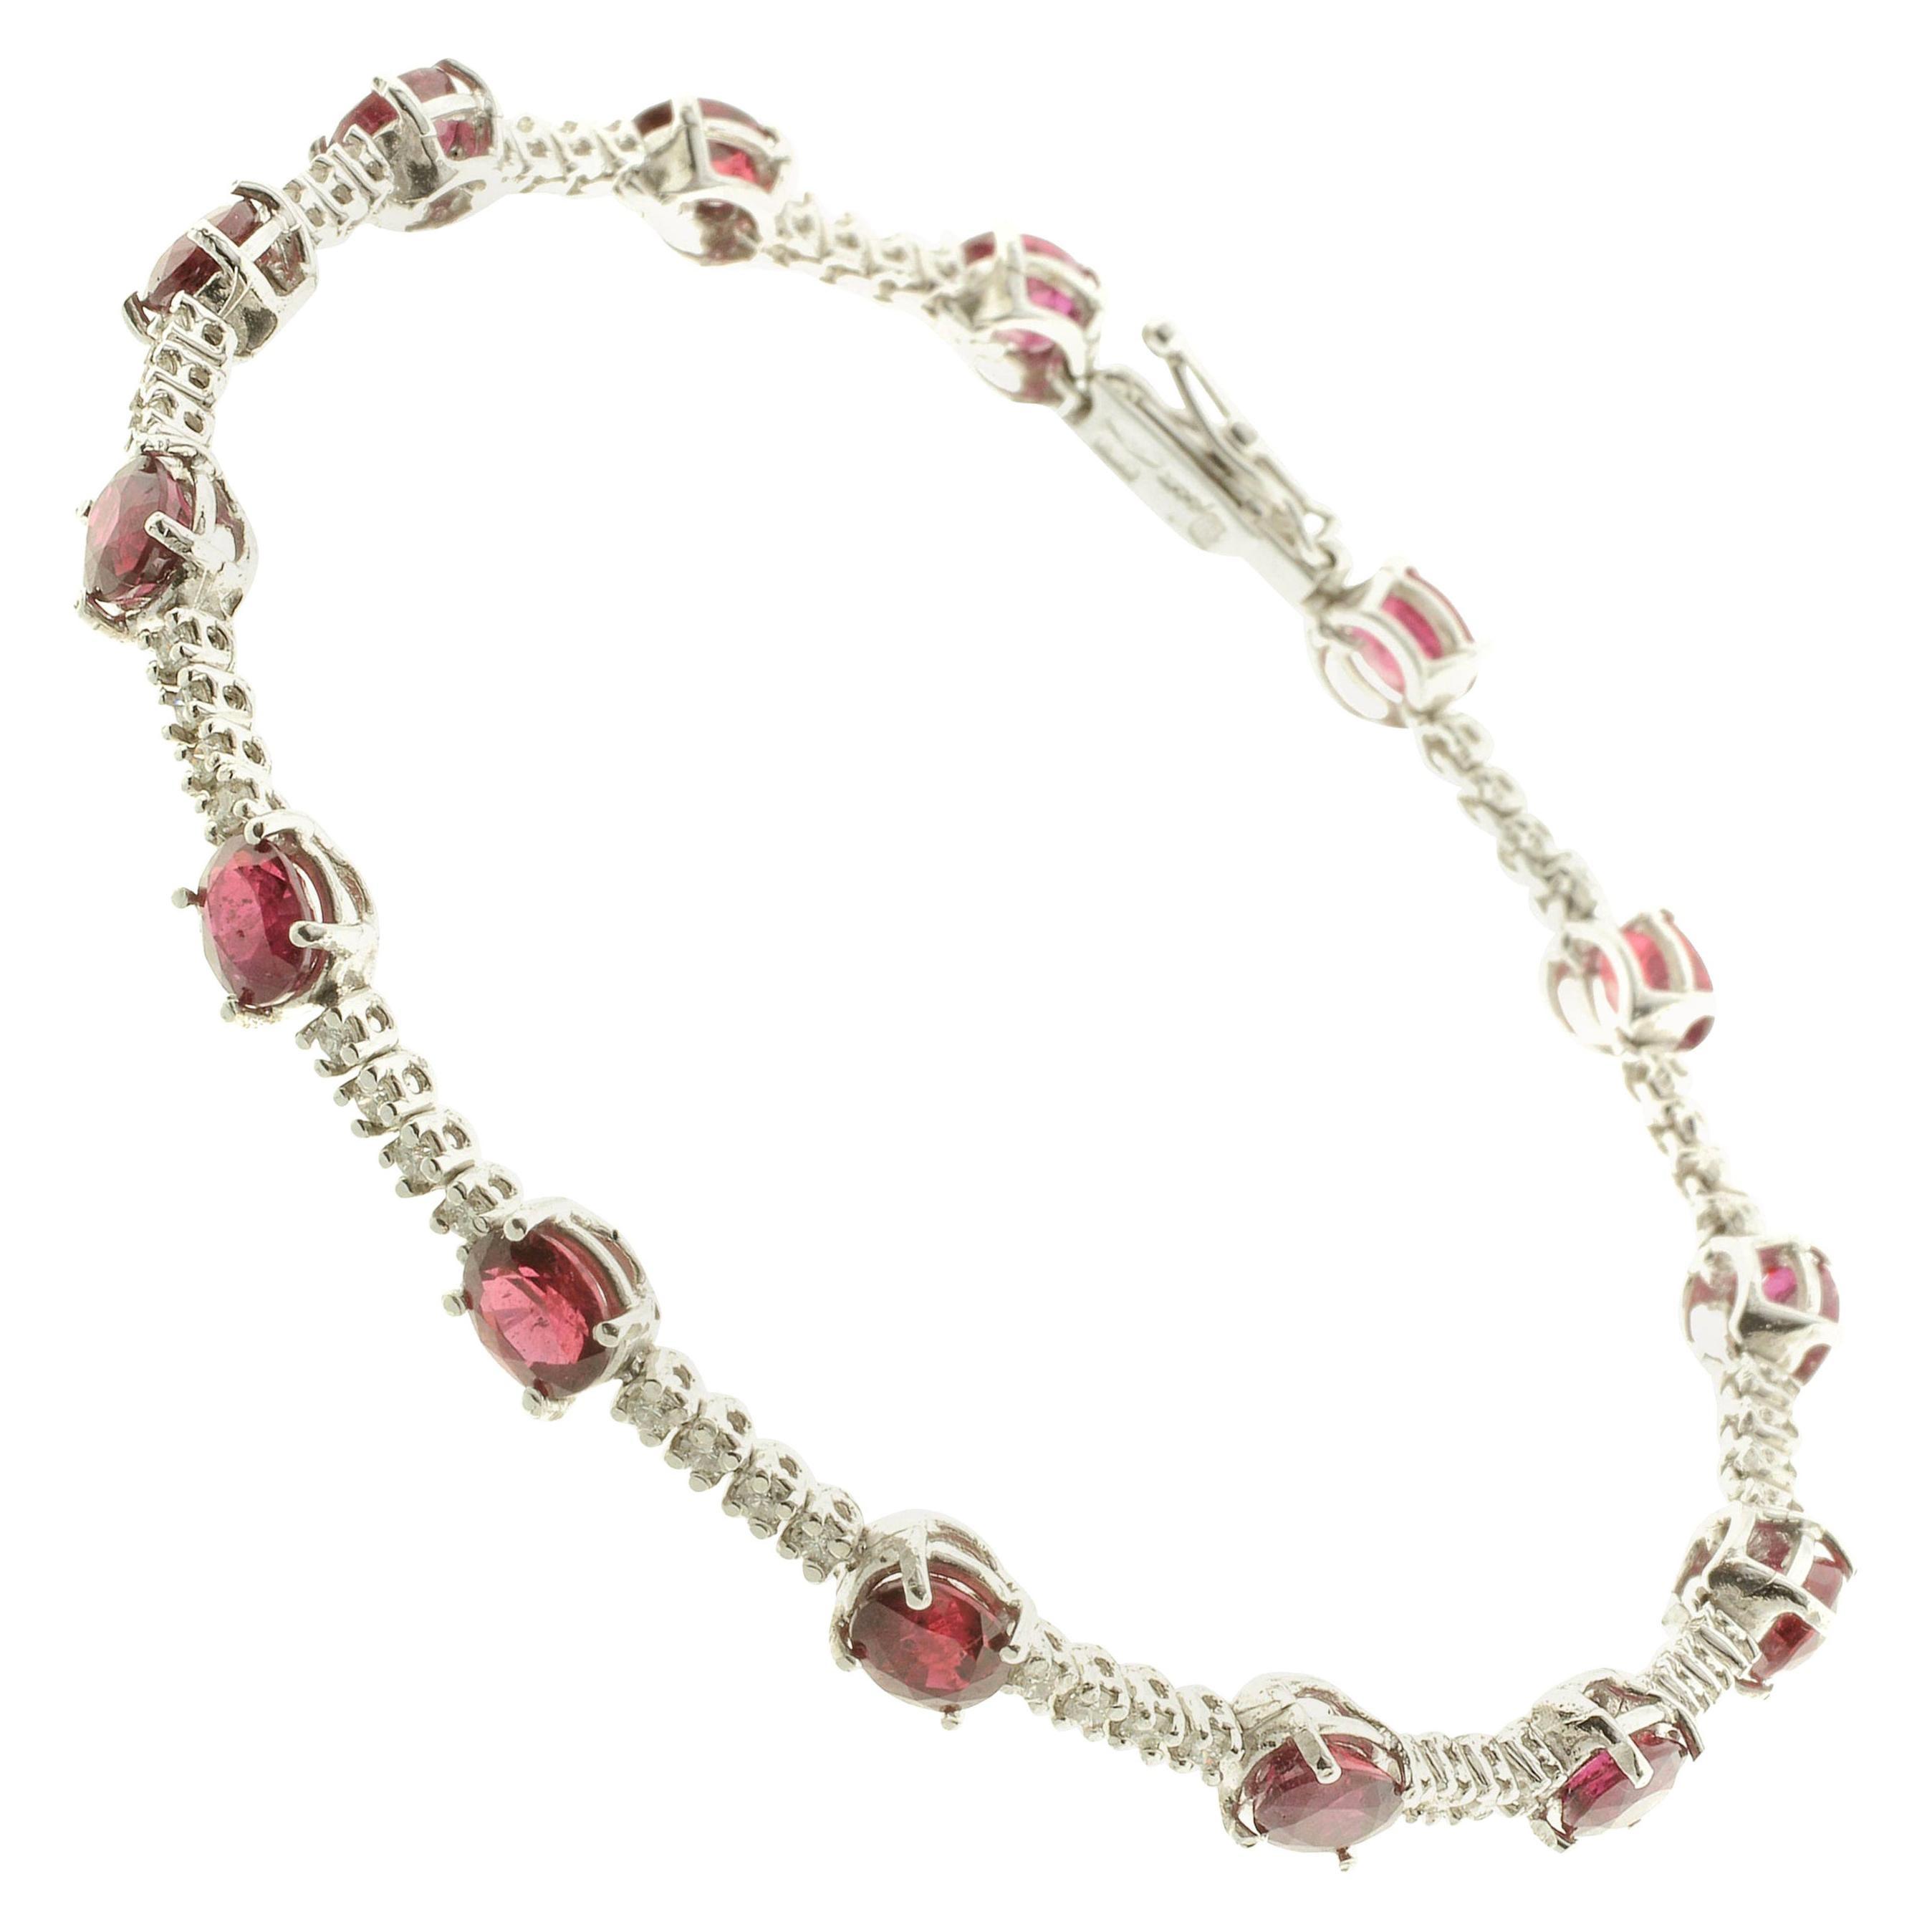 Diamond and Ruby Tennis Bracelet